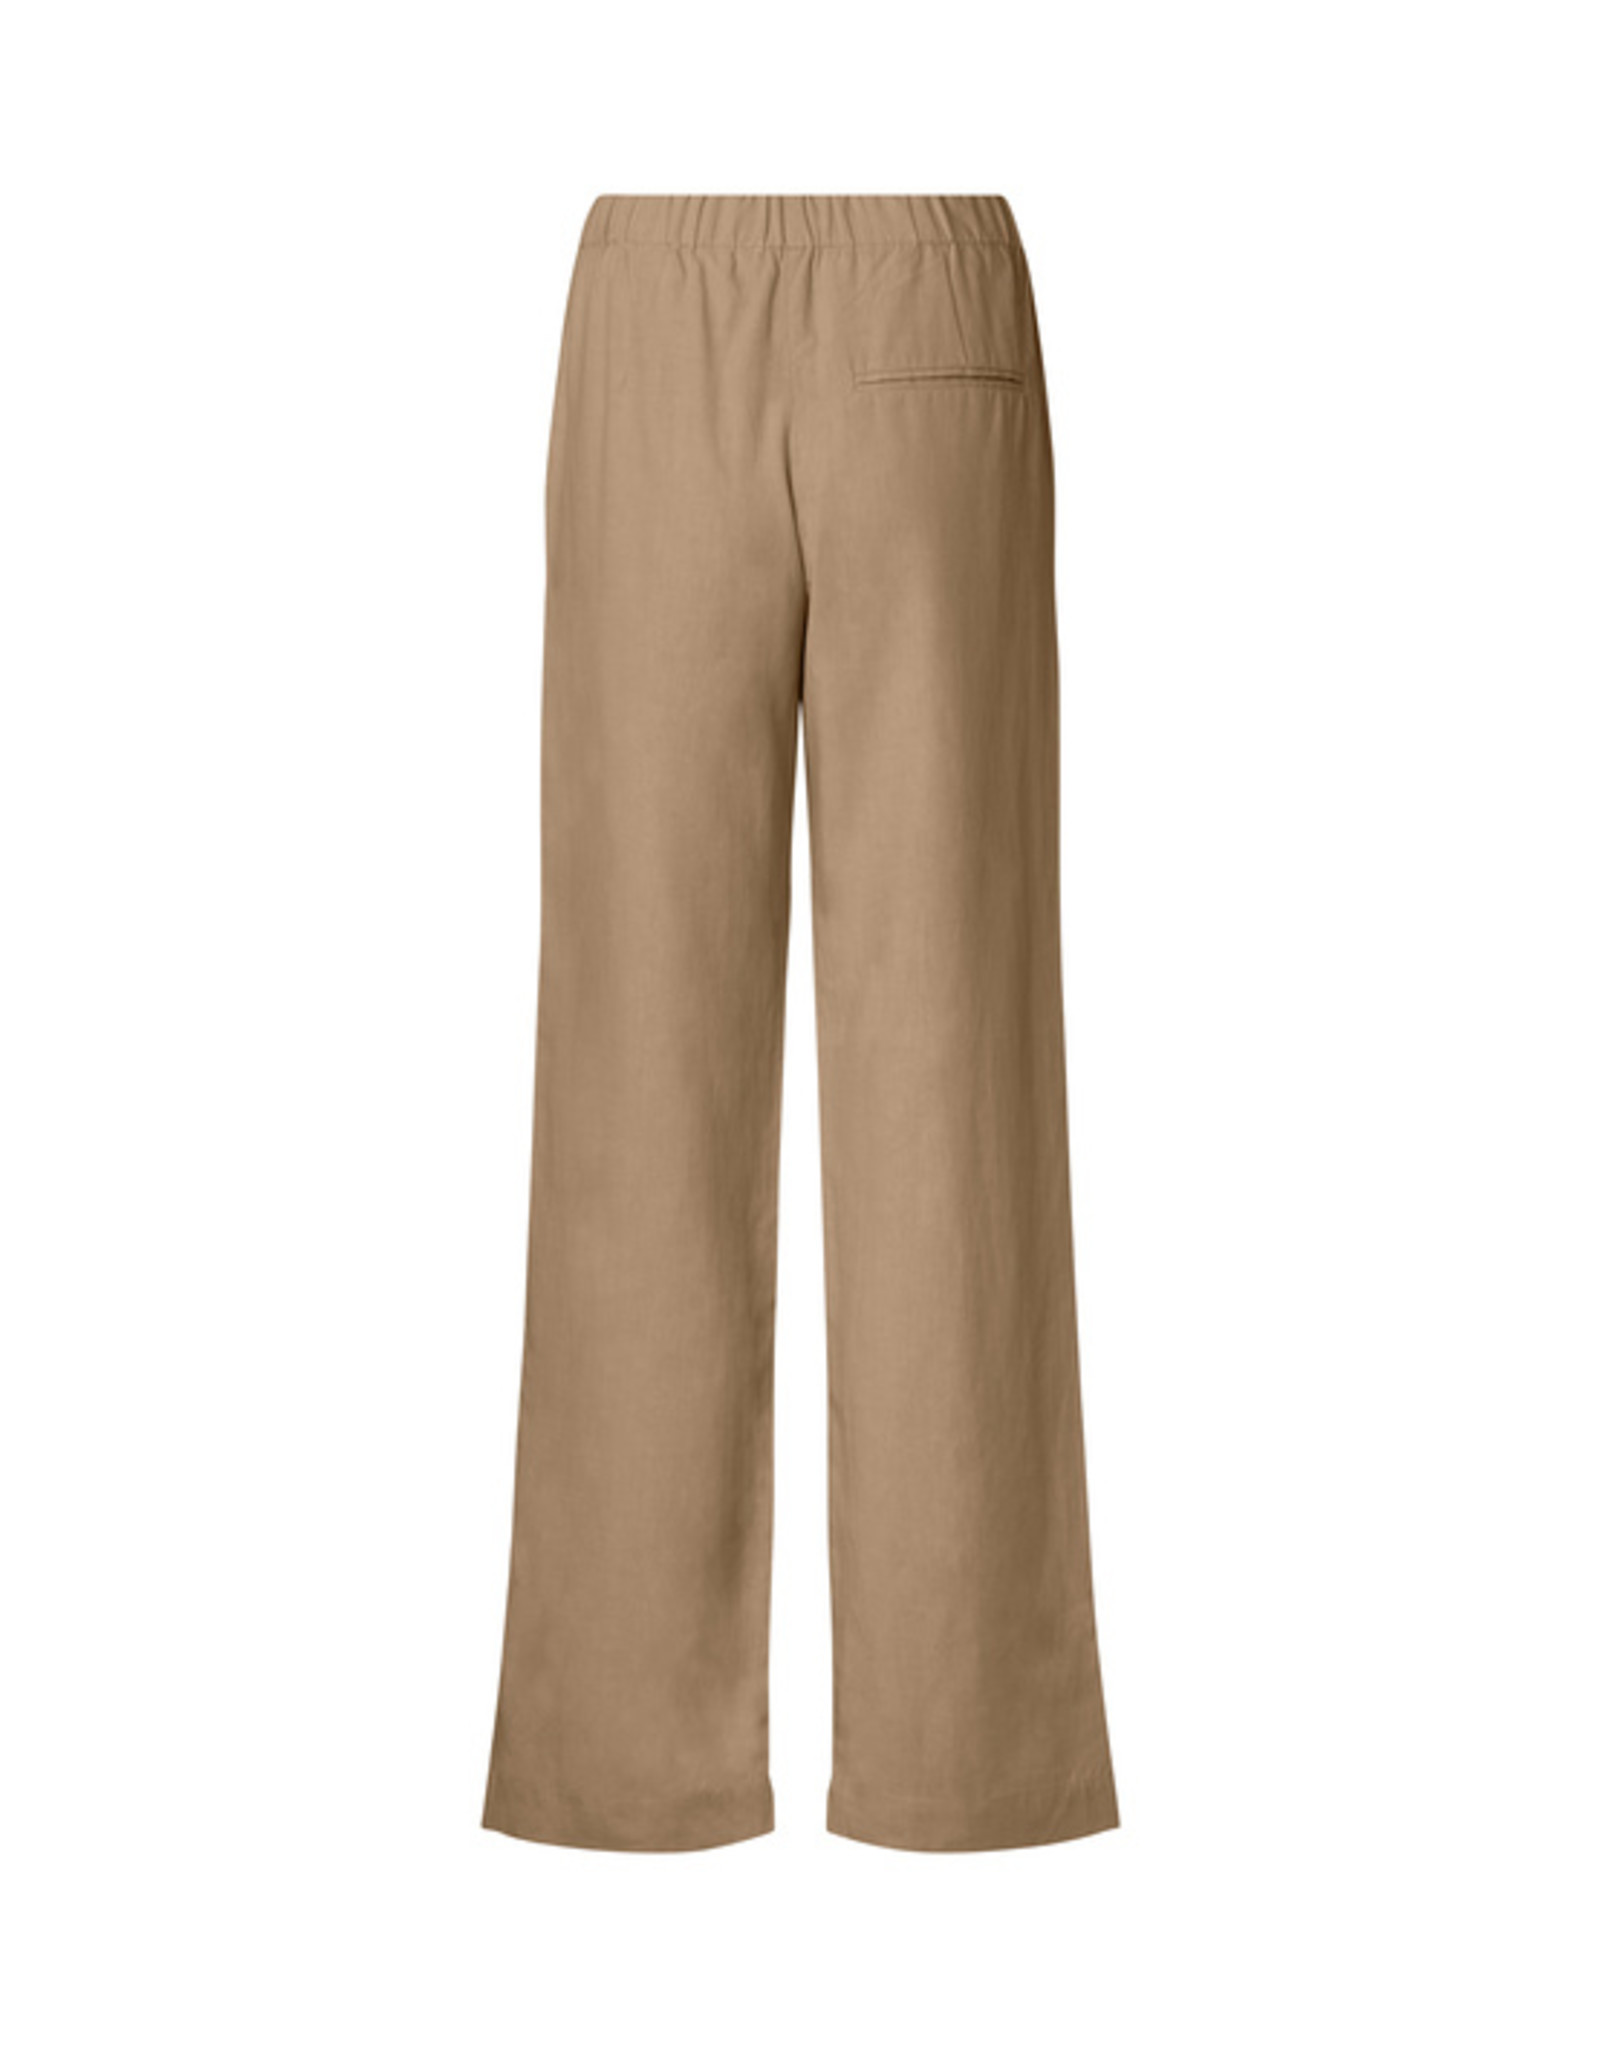 Samsoe & Samsoe Hoys straight pants CARIBOU lyocell